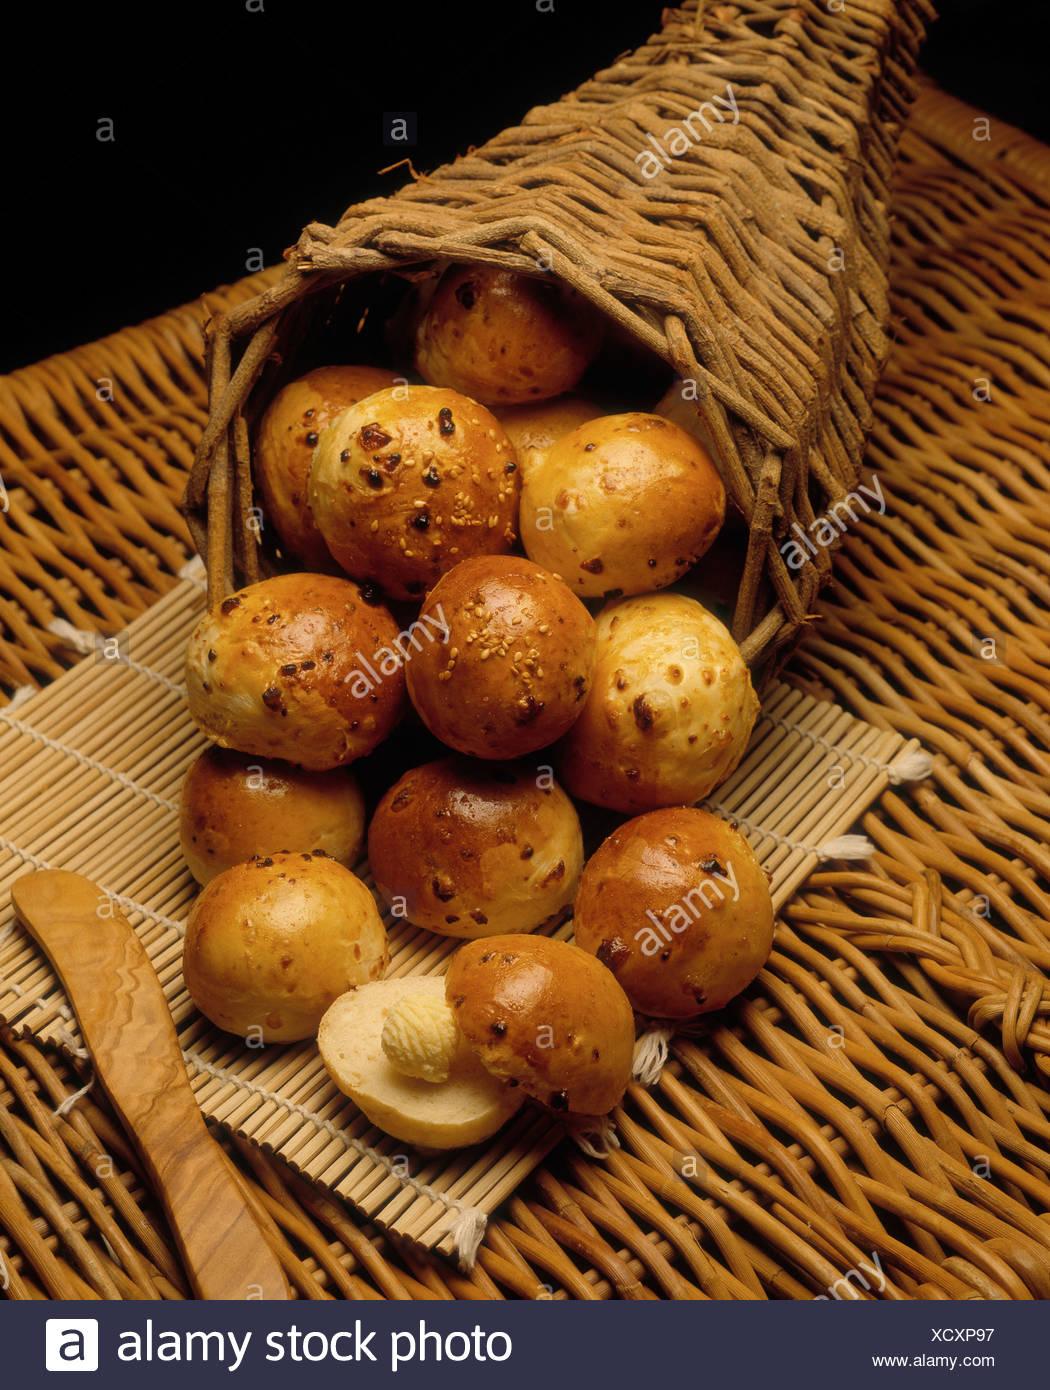 Cornucopia of fresh rolls - Stock Image